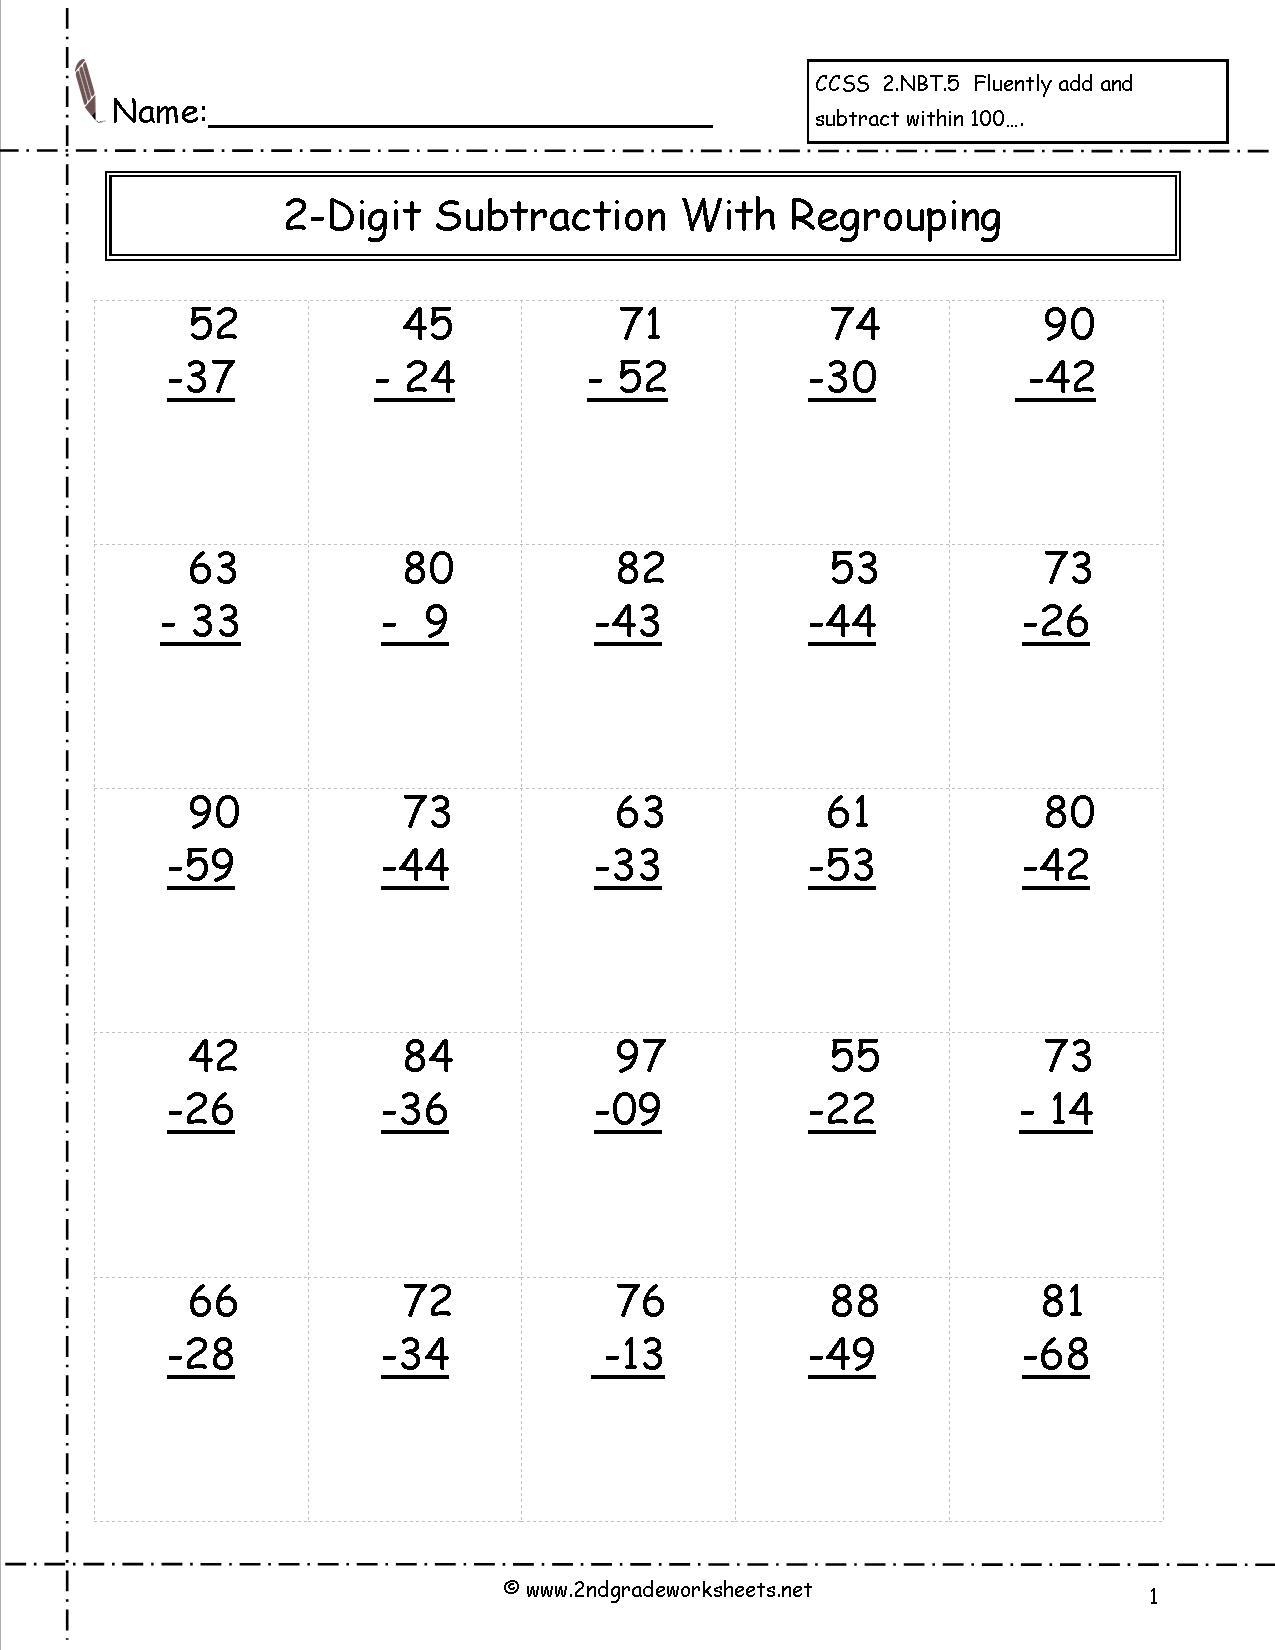 17 Best Images Of Free Printable Measurement Worksheets